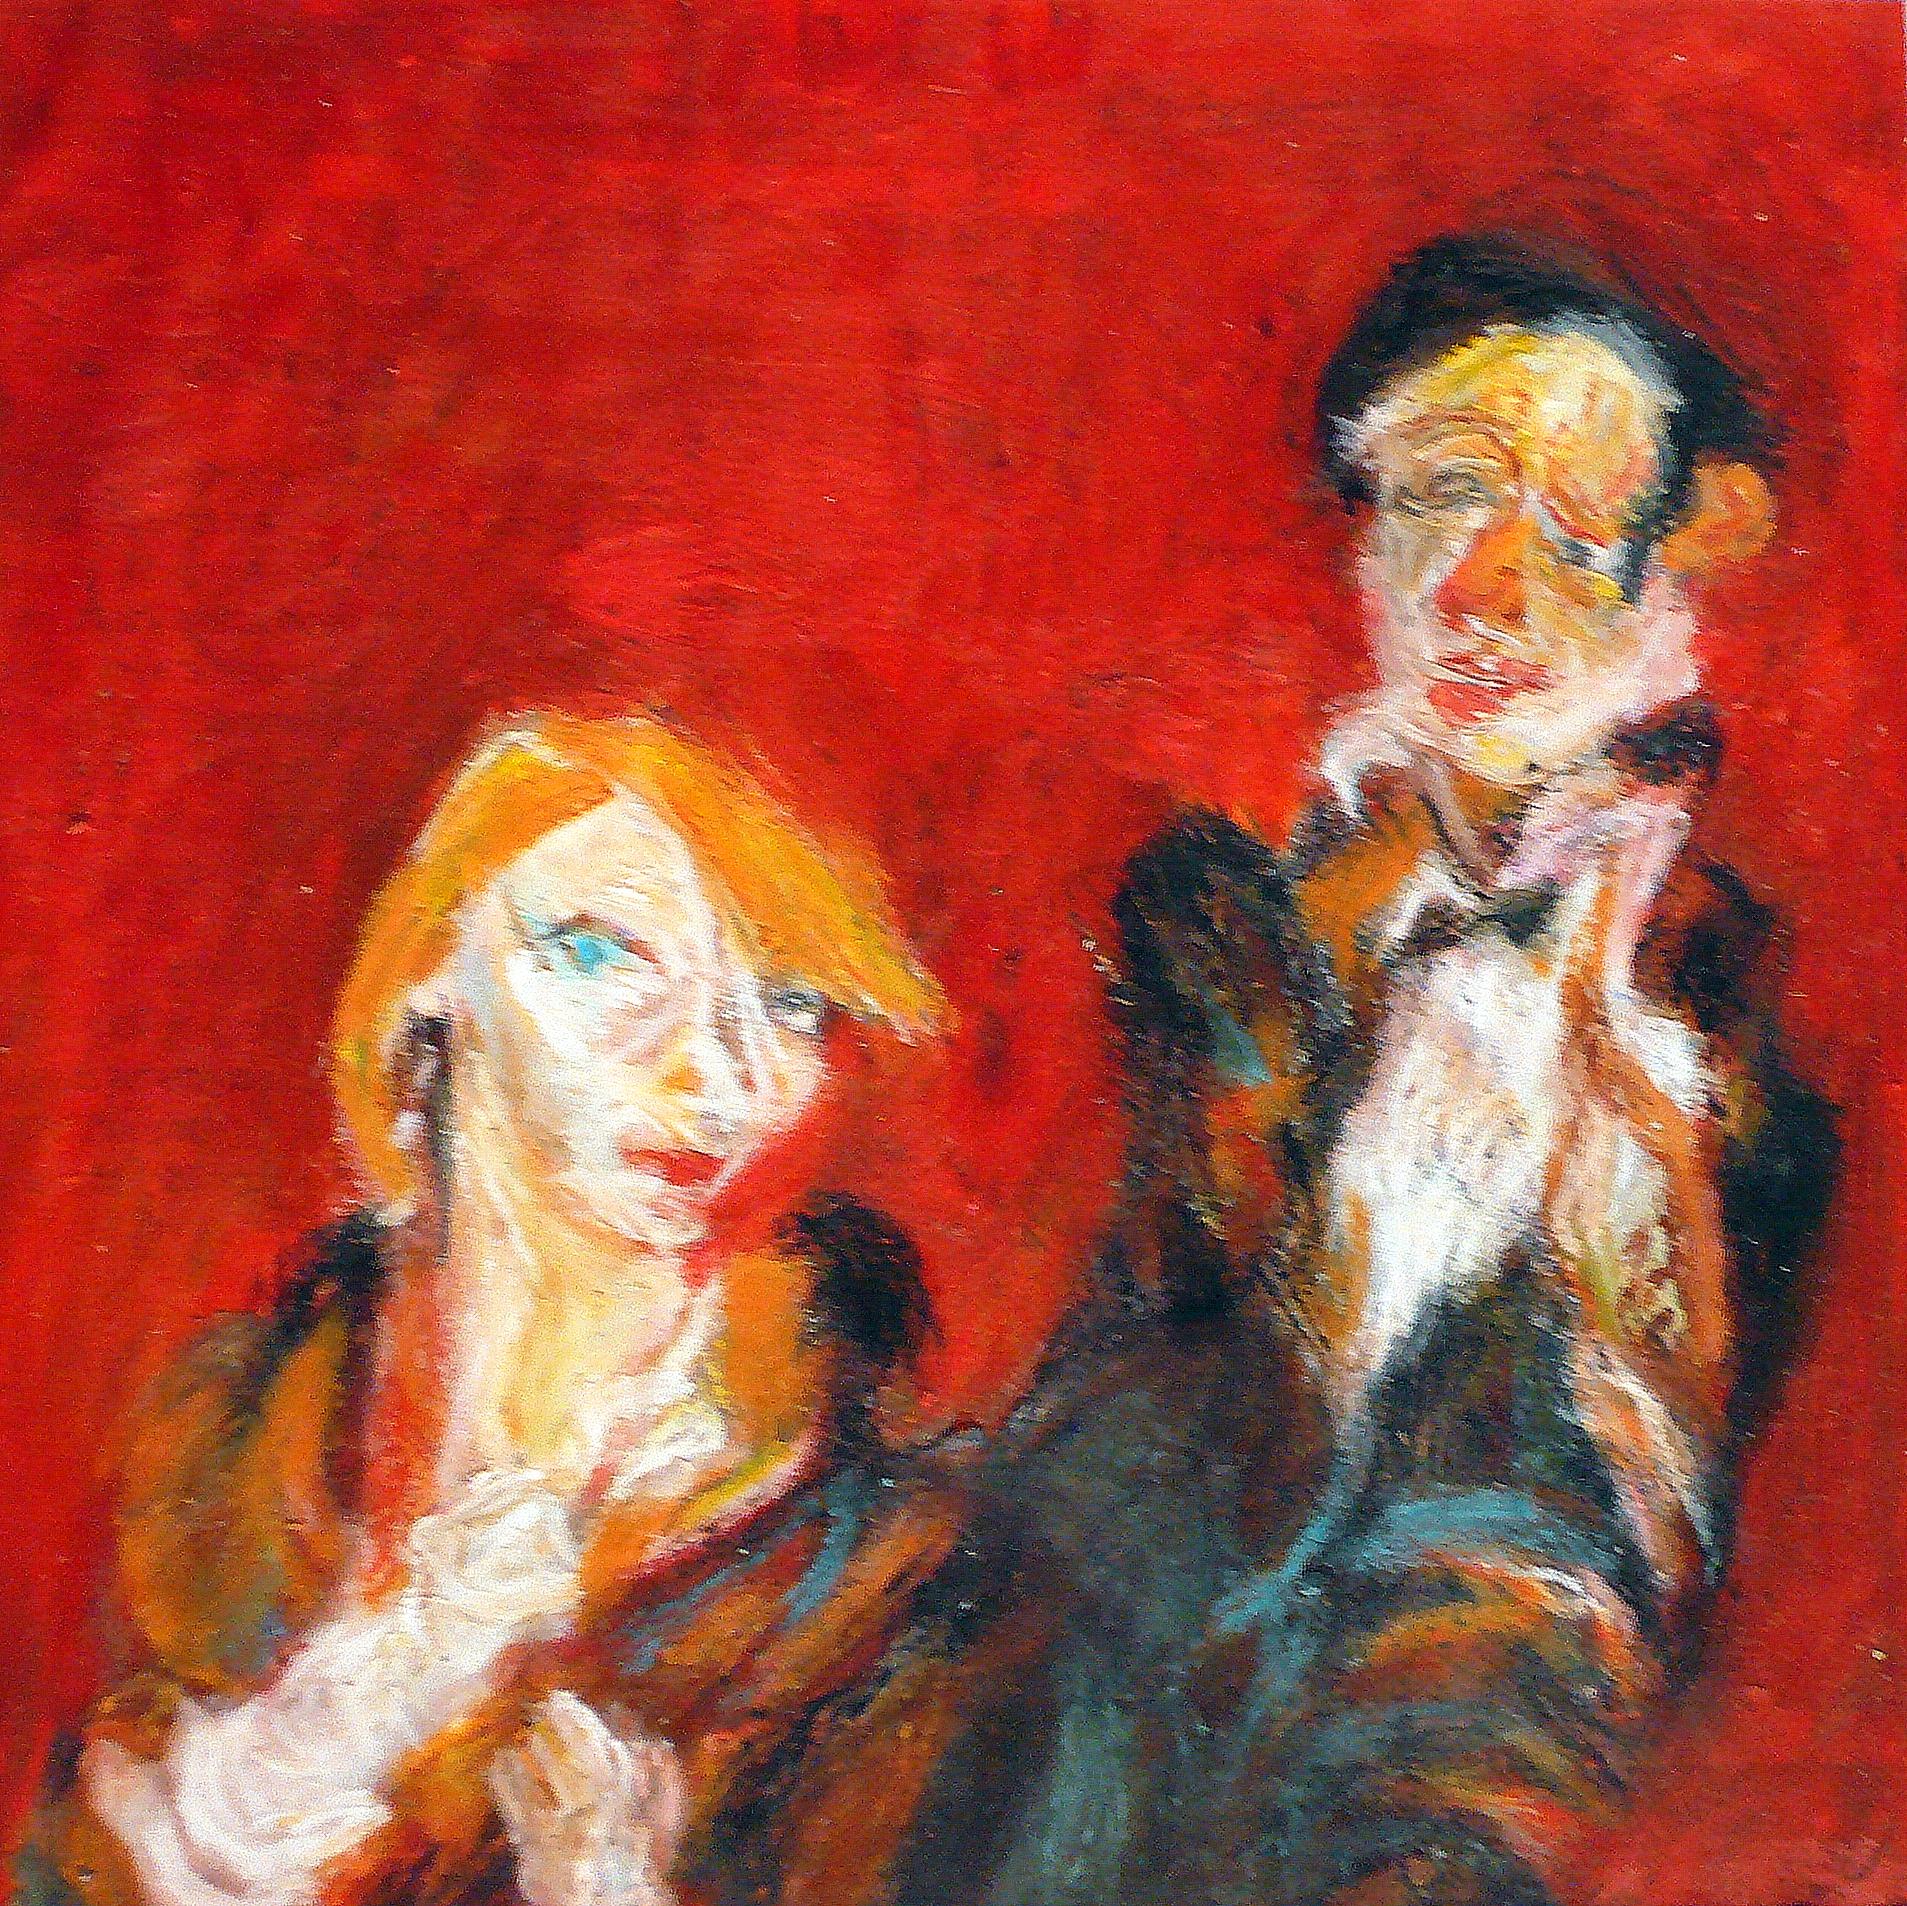 Mr. & Mrs. Pearlman